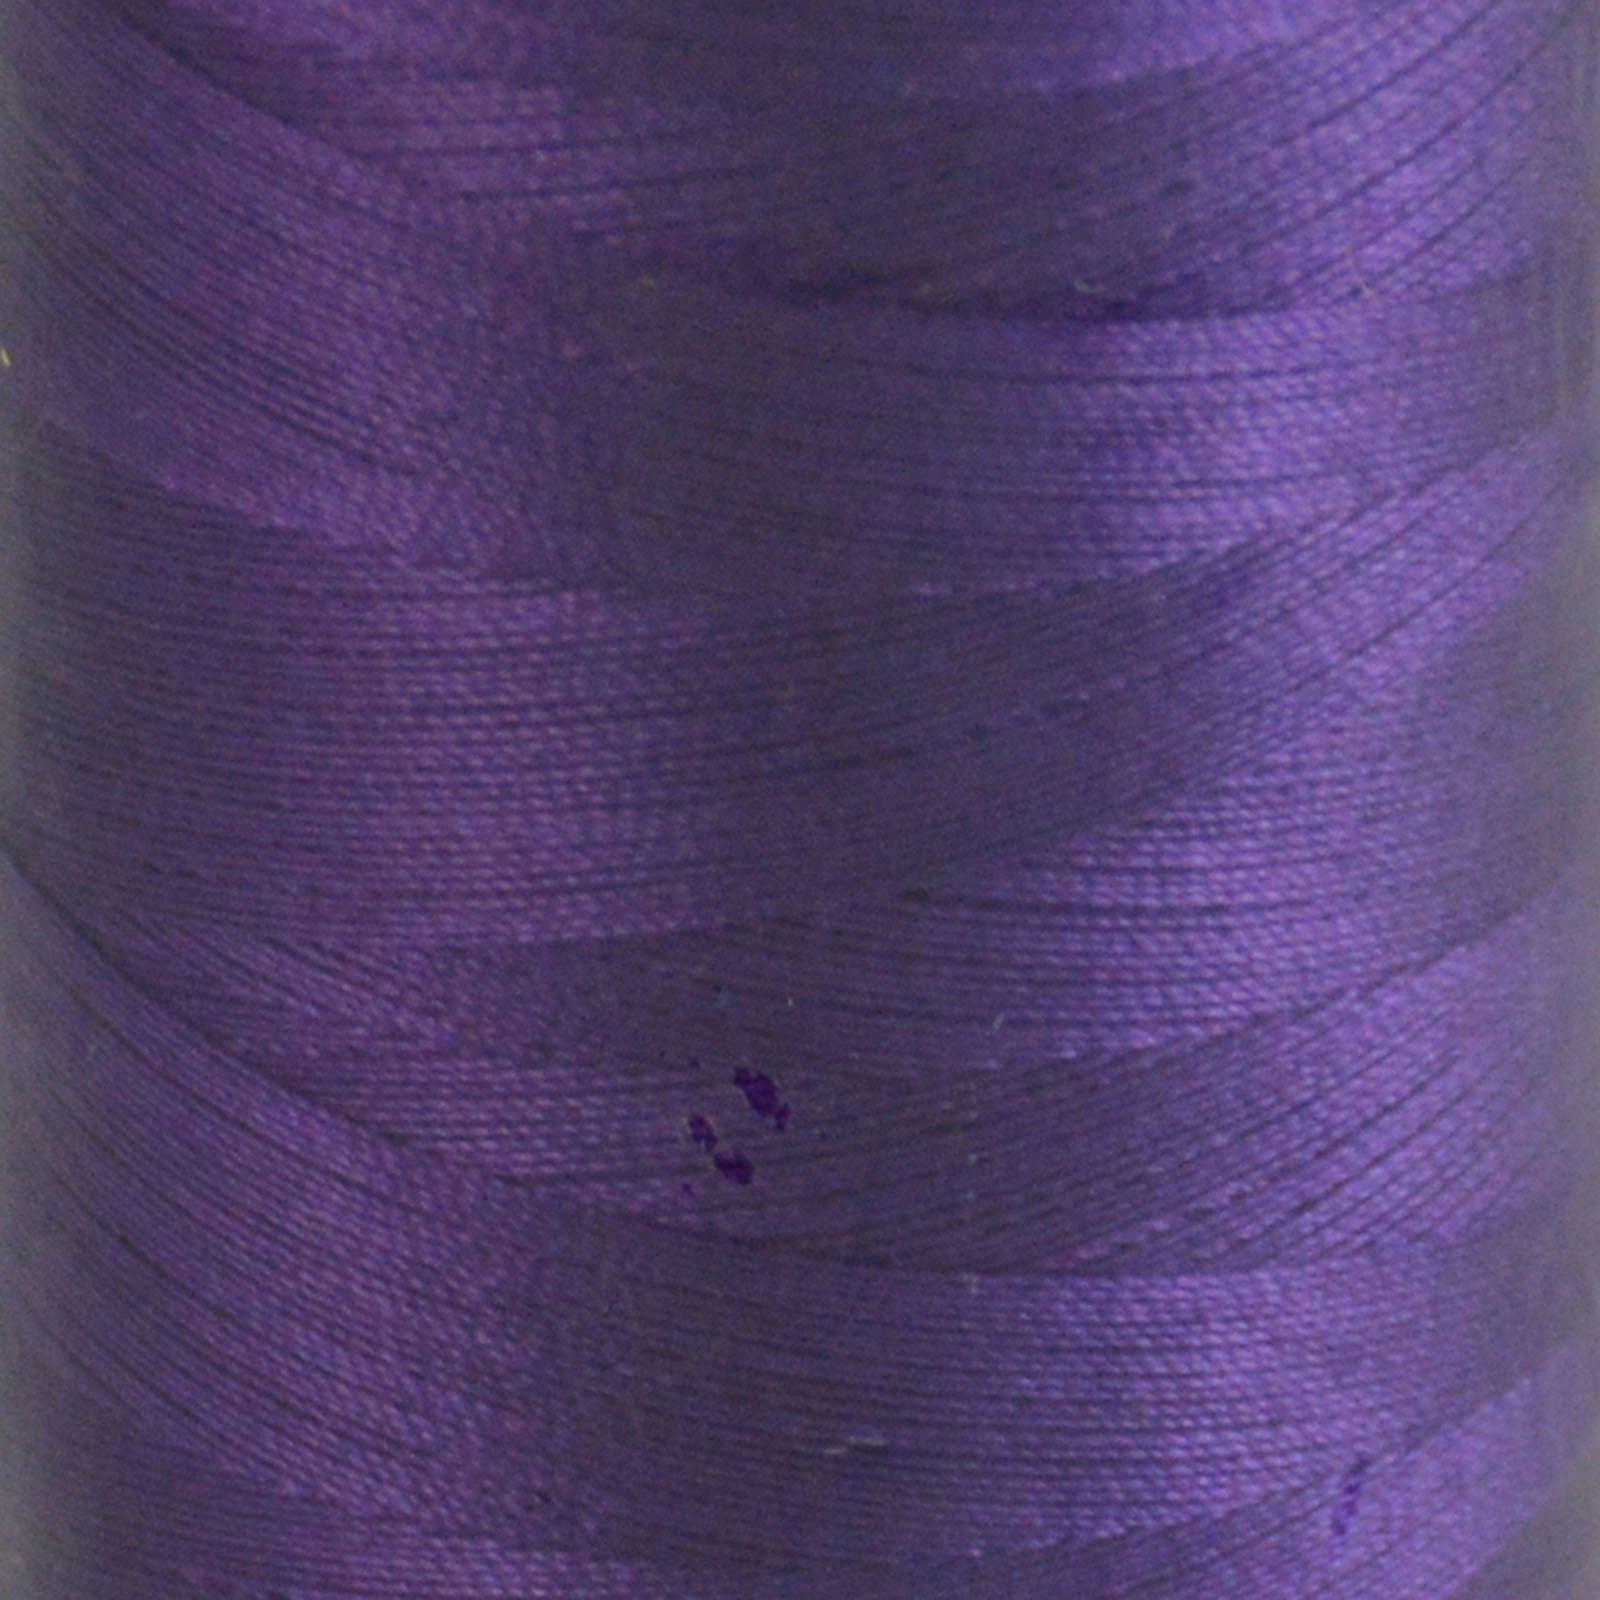 # 2582 Dark Violet